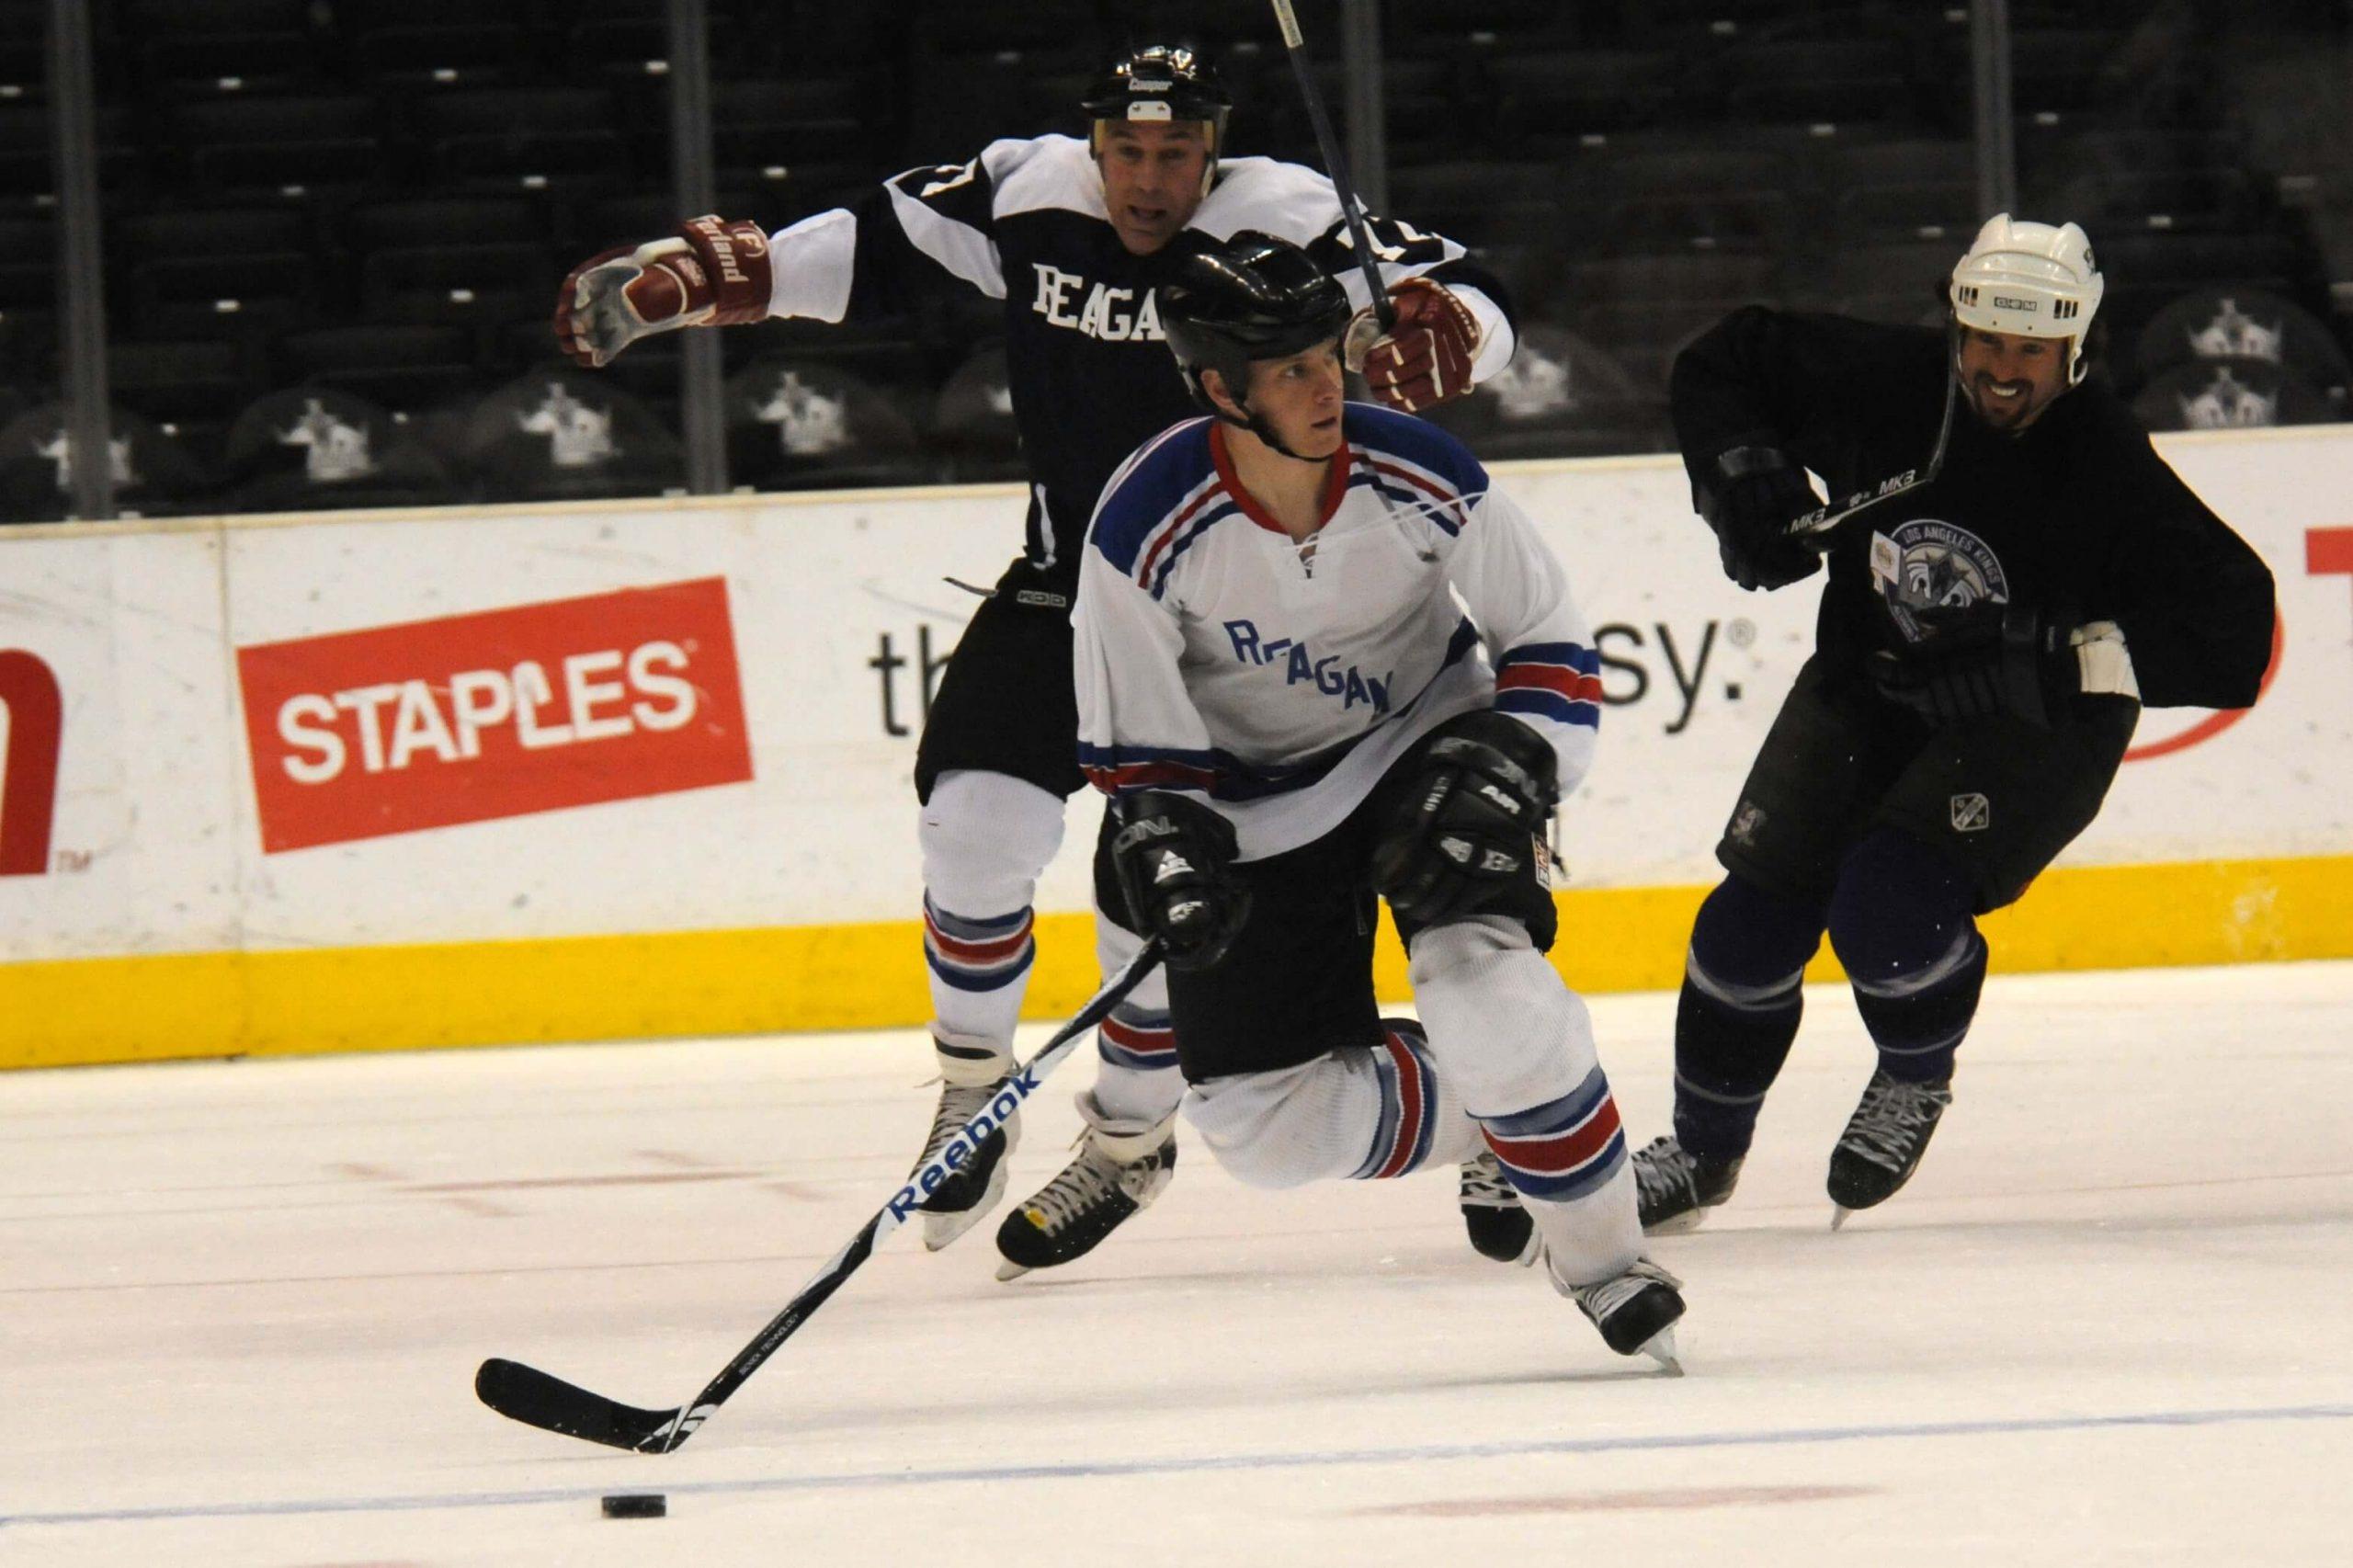 Hockey player on a breakaway